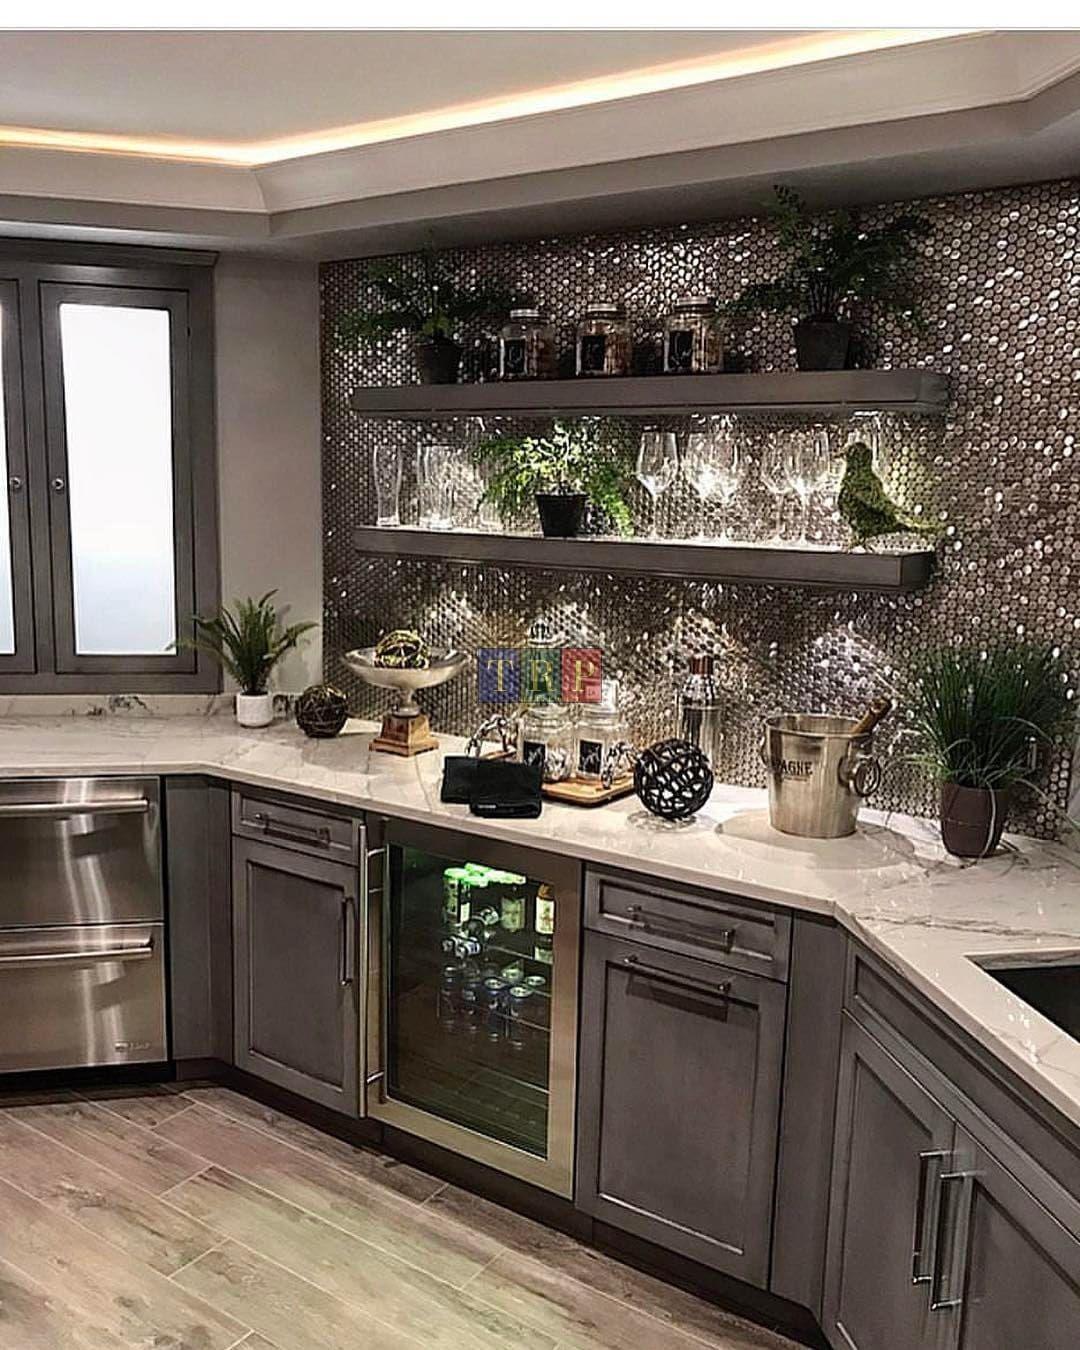 20 Kitchen Basement Ideas Basement Kitchenette Bar Pictures Cost Home Bar Decor Bars For Home Interior Design Kitchen